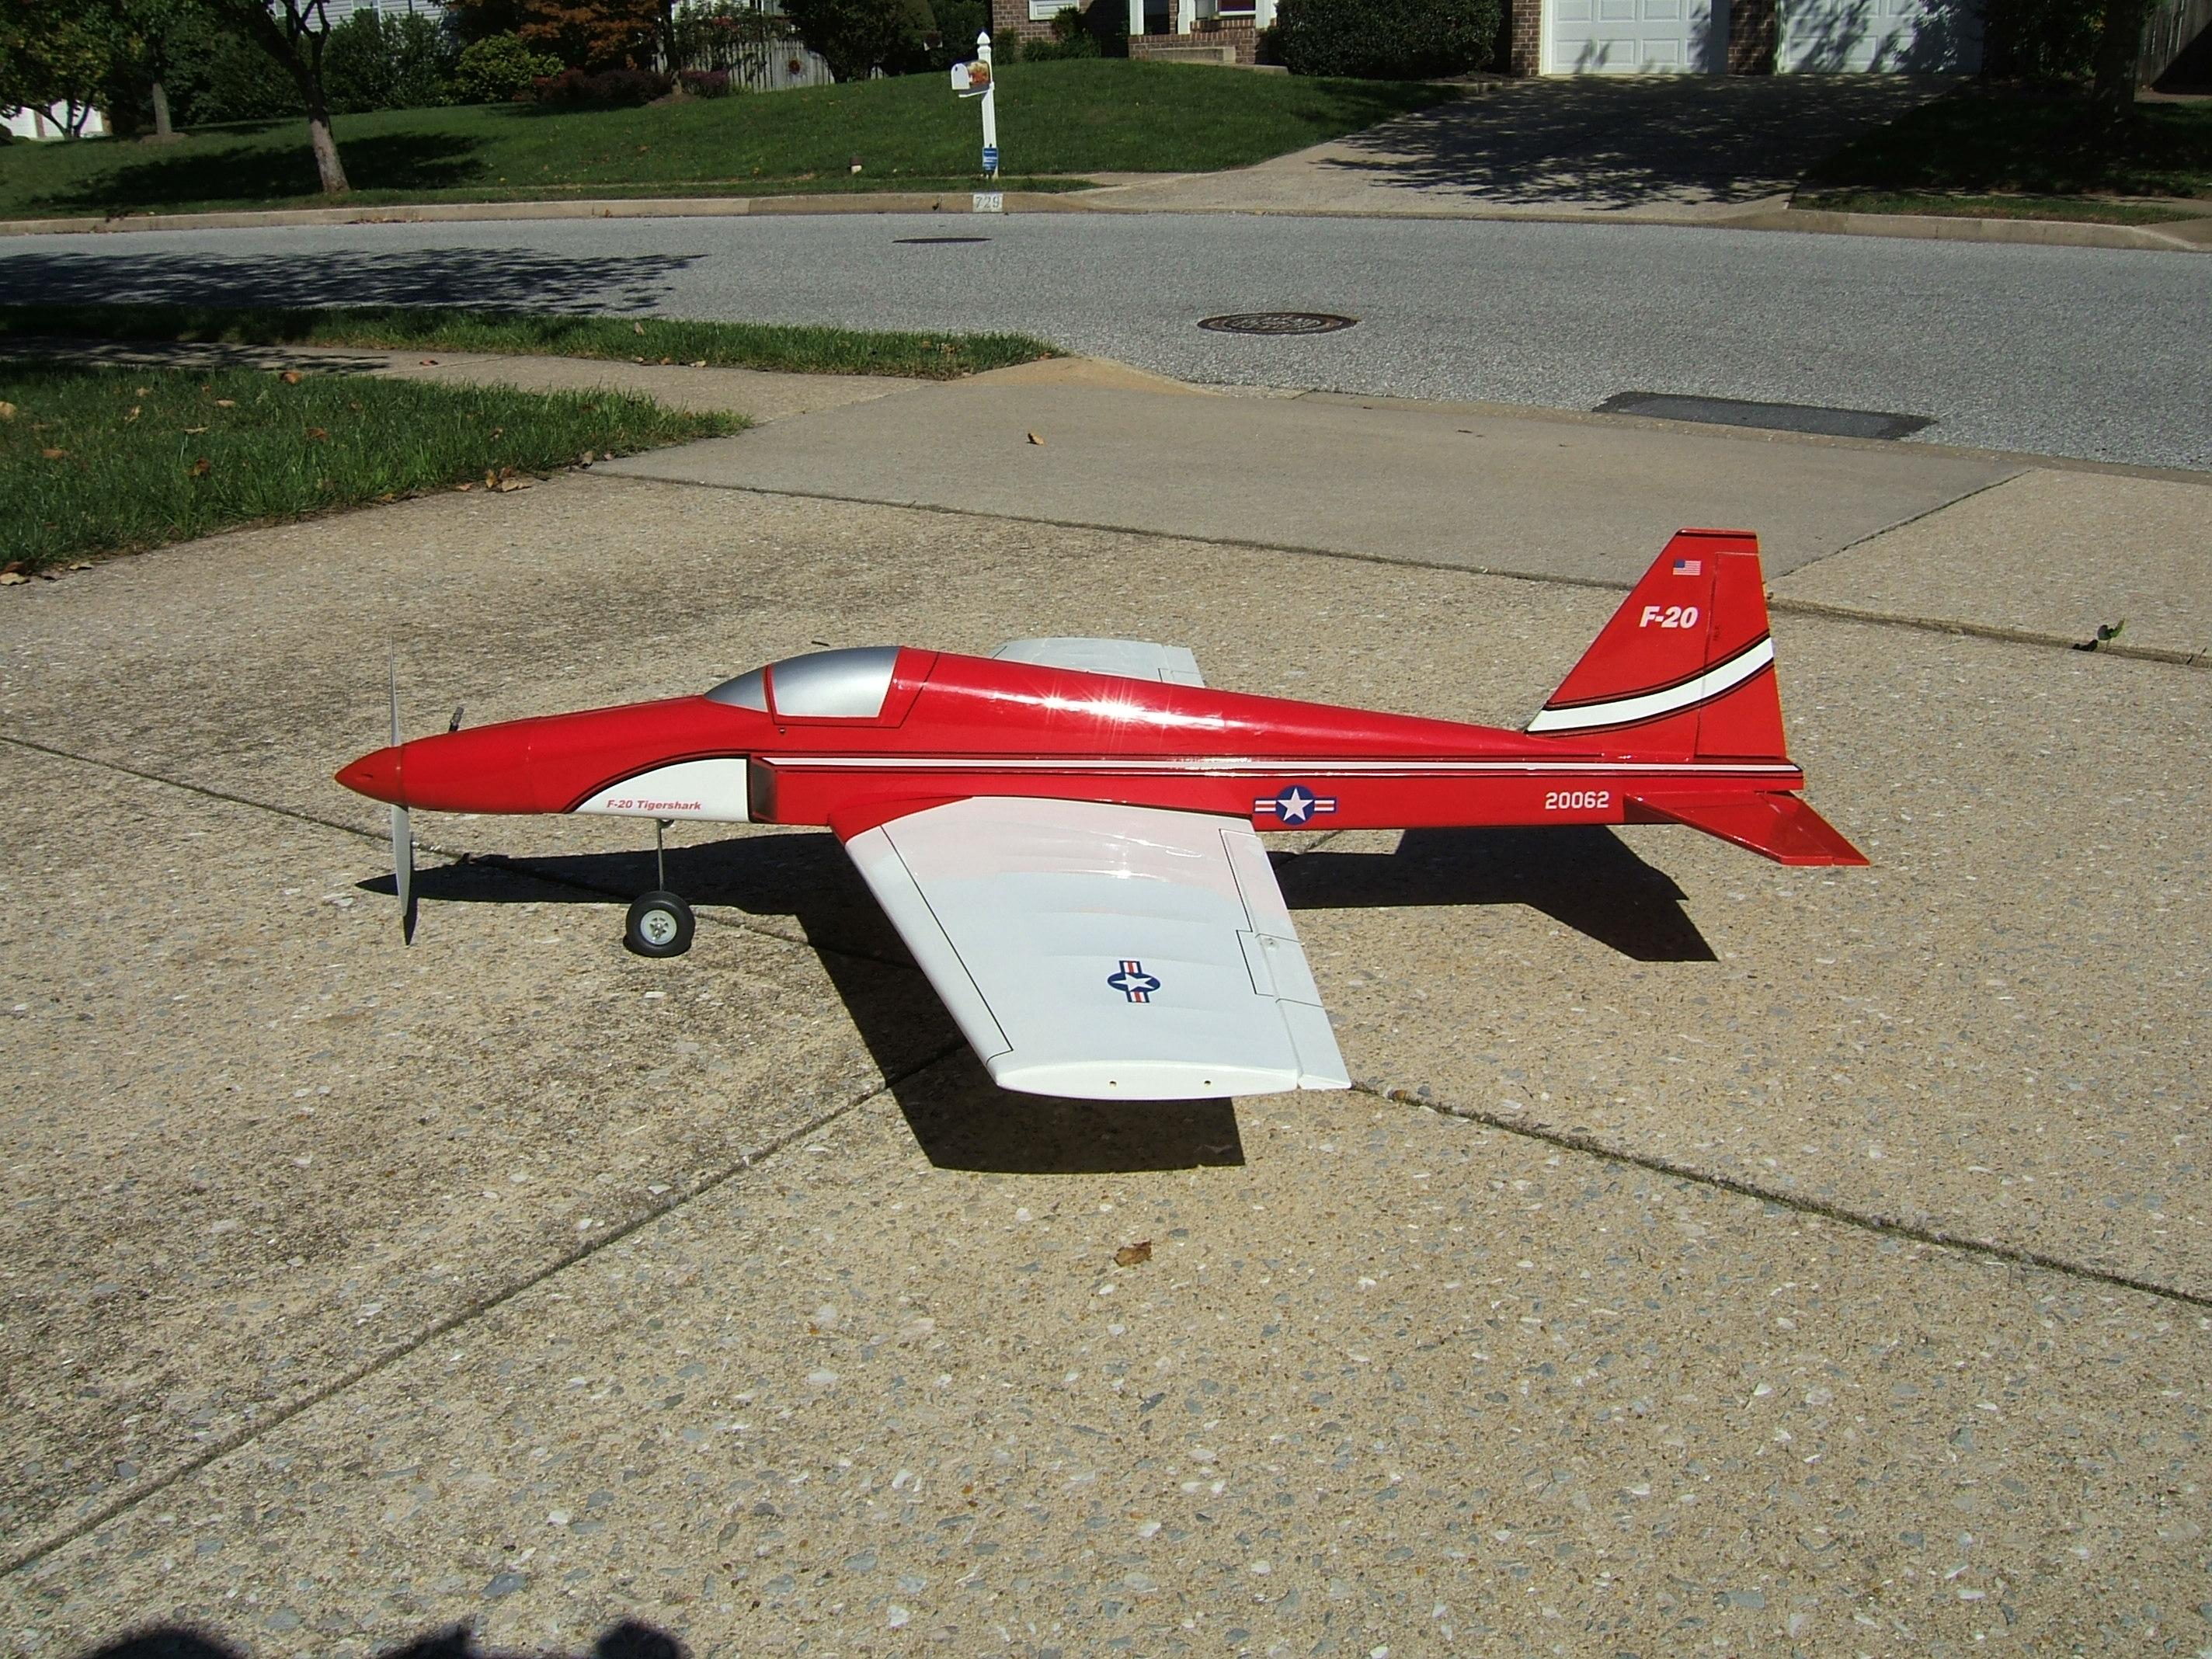 F-20 Tigershark Makeover - Model Airplane News